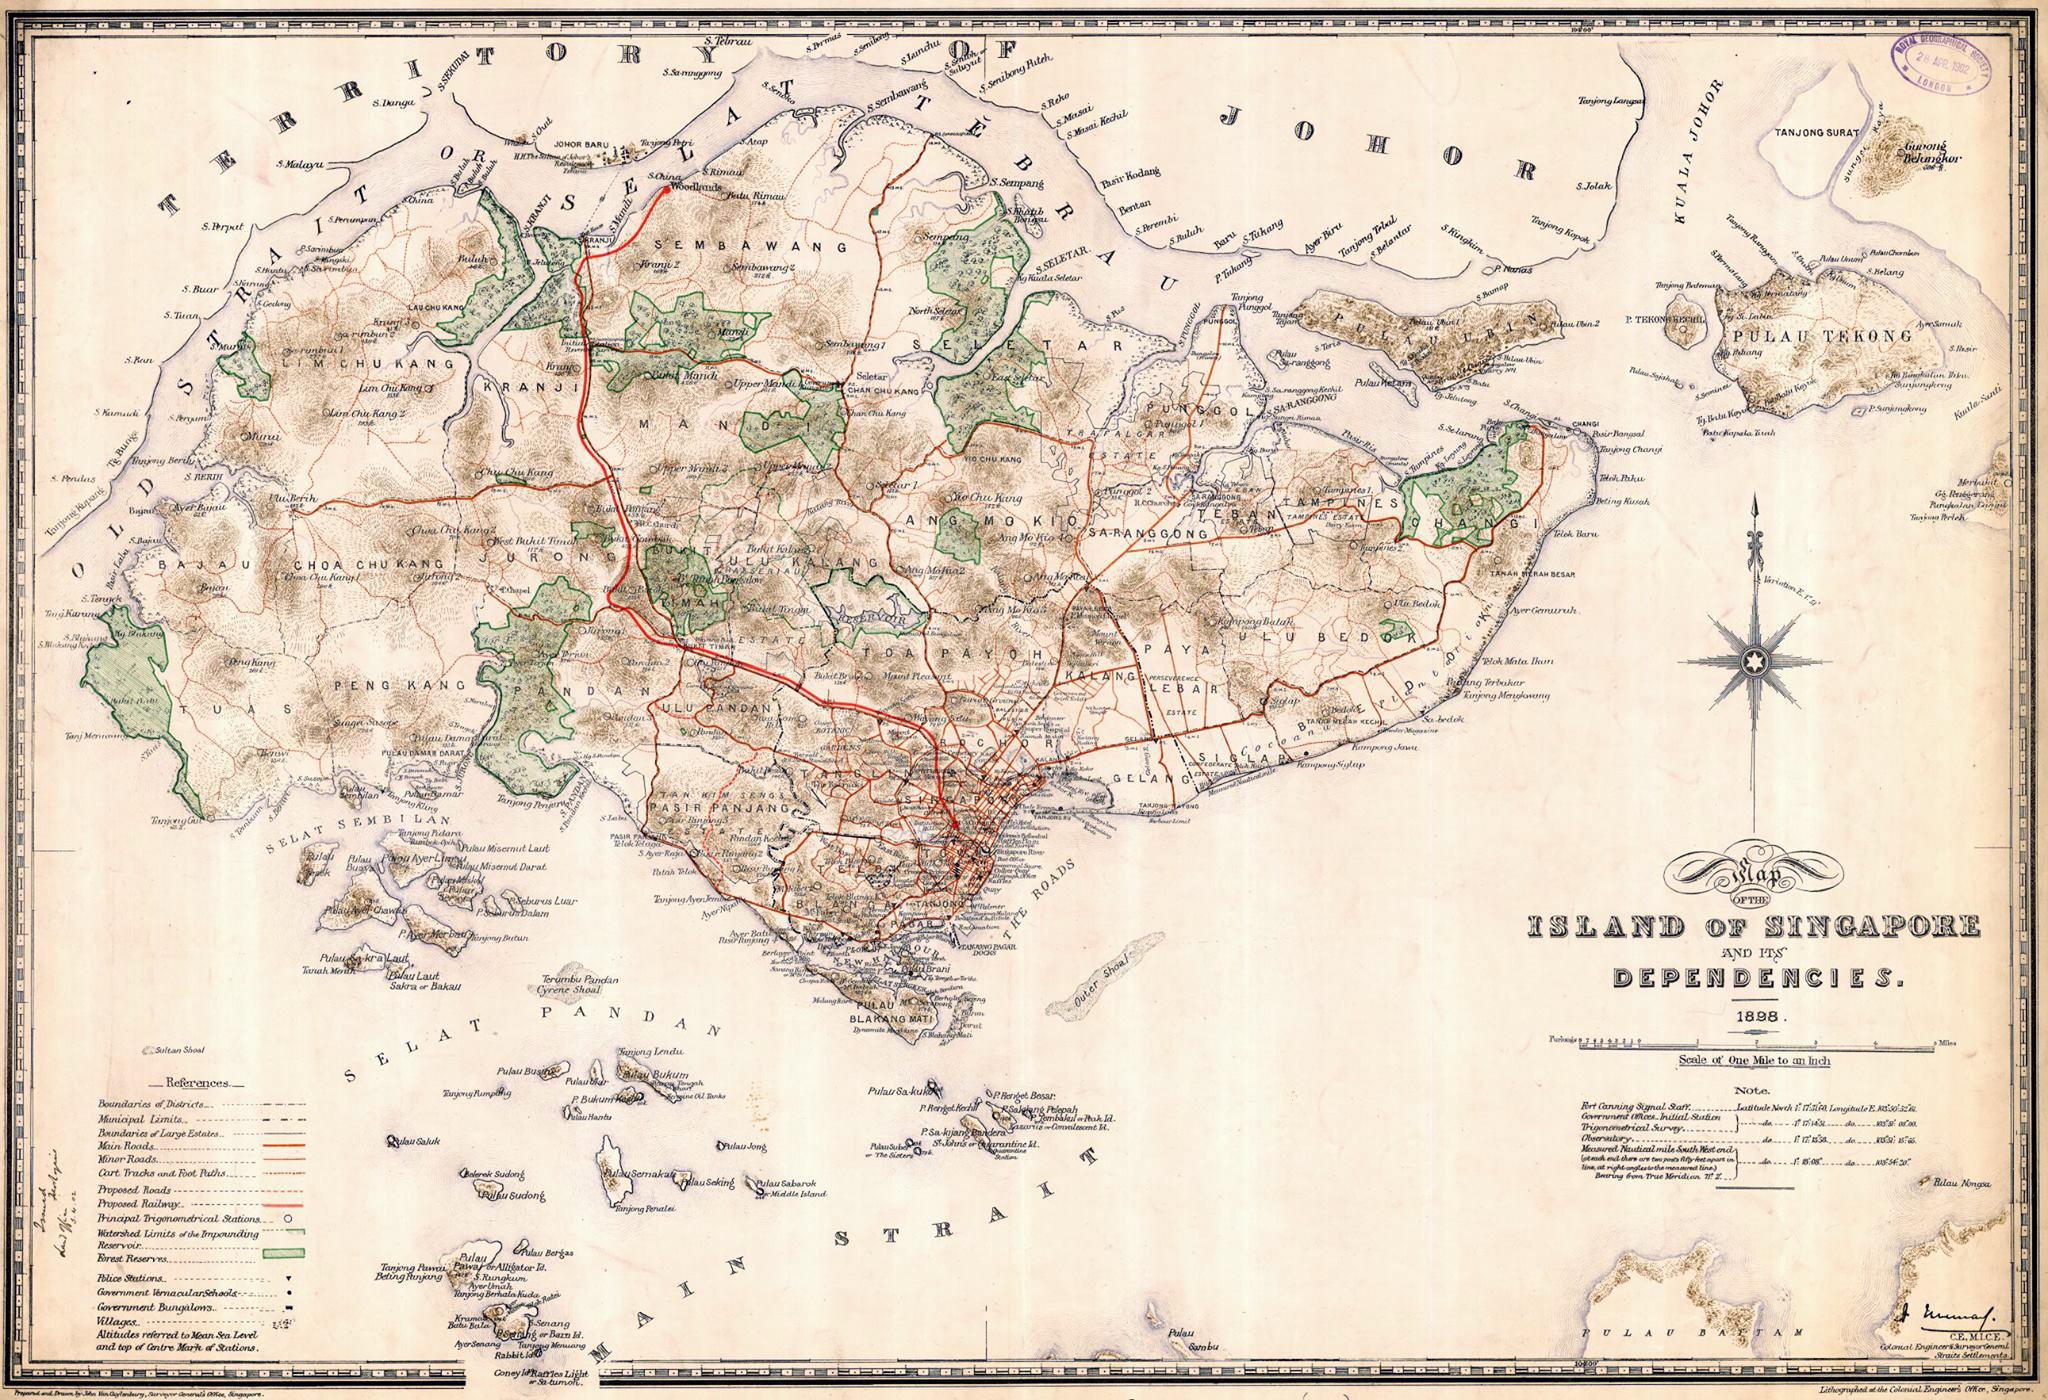 Large old map of Singapore - 1898 | Singapore | Asia ... on southeast asia, brazil map, africa map, kuala lumpur, united states map, japan map, southeast pacific map, europe map, cyprus map, philippines map, chongqing map, singapore airlines, british columbia map, vatican map, singapore dollar, slovenia map, senegal map, mrt map, oceania map, taiwan map, qatar map, hong kong, ho chi minh city, hong kong map, asia map, china map,